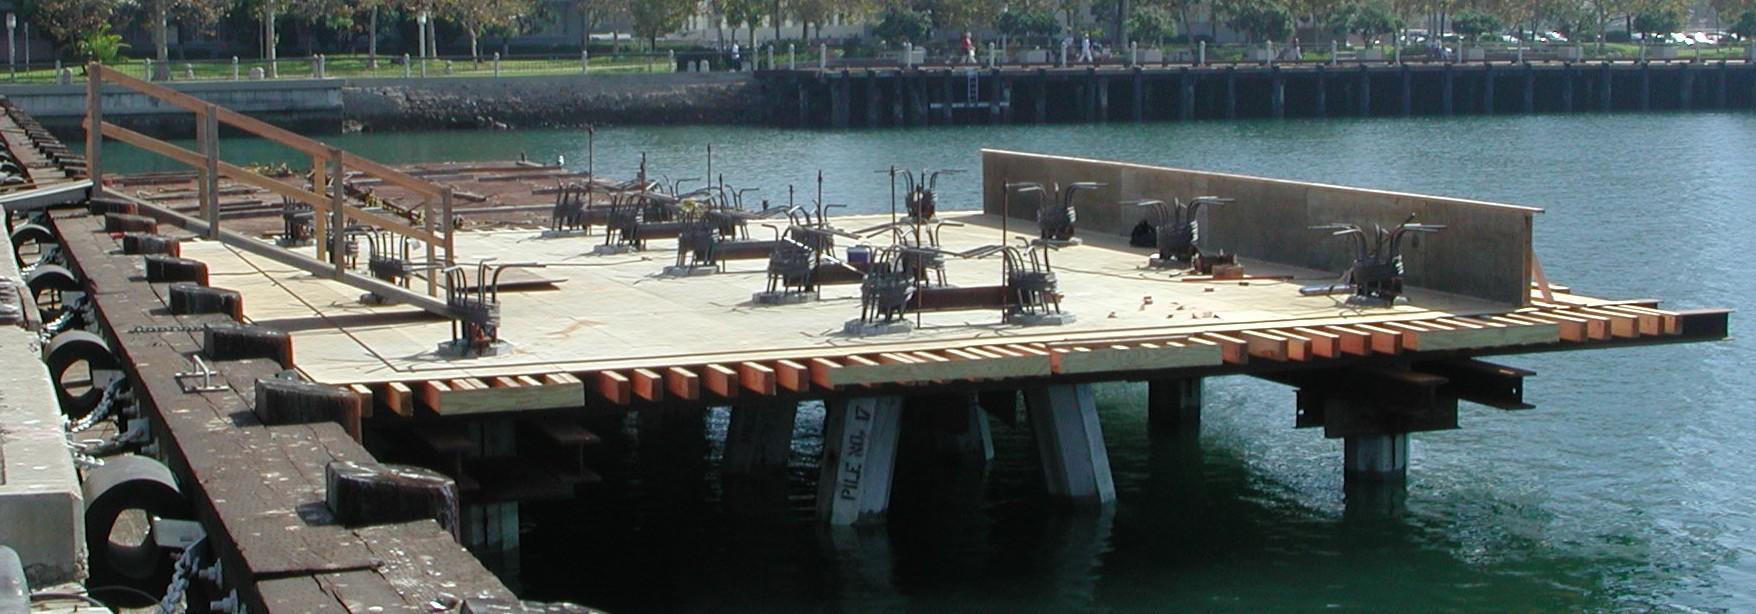 USS Midway Museum Mooring Platforms